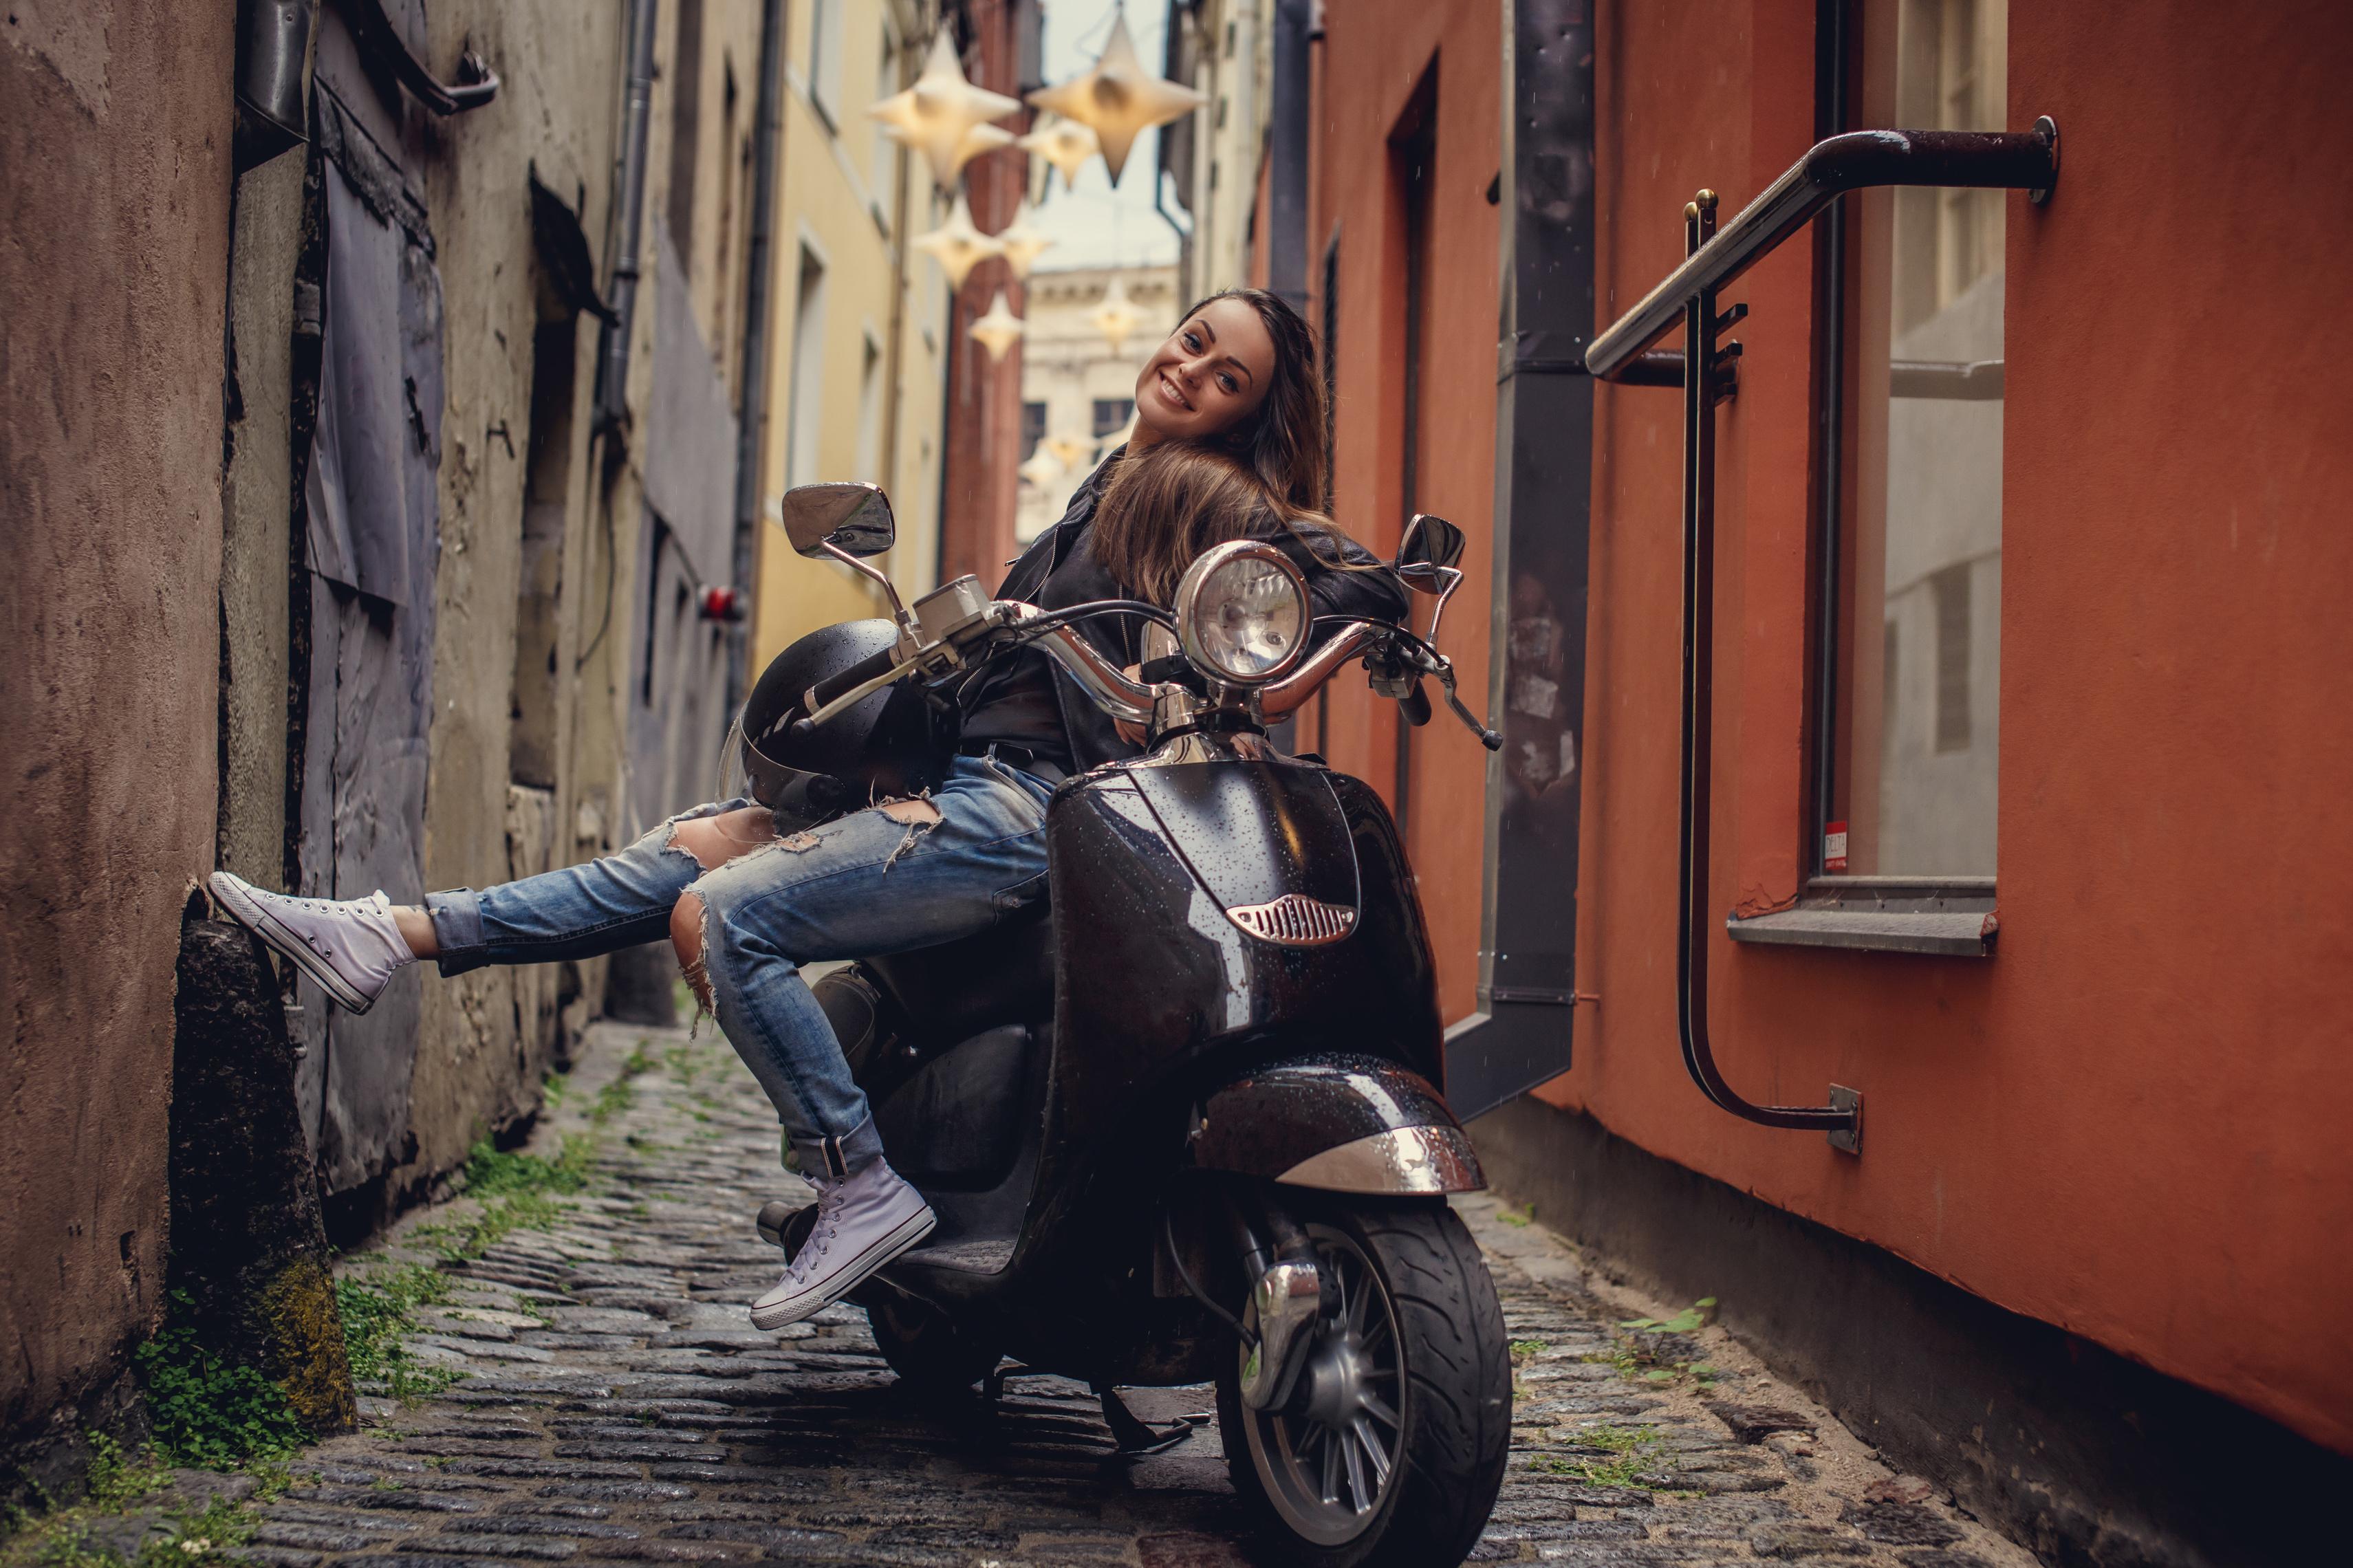 Junge Frau posiert auf Moped